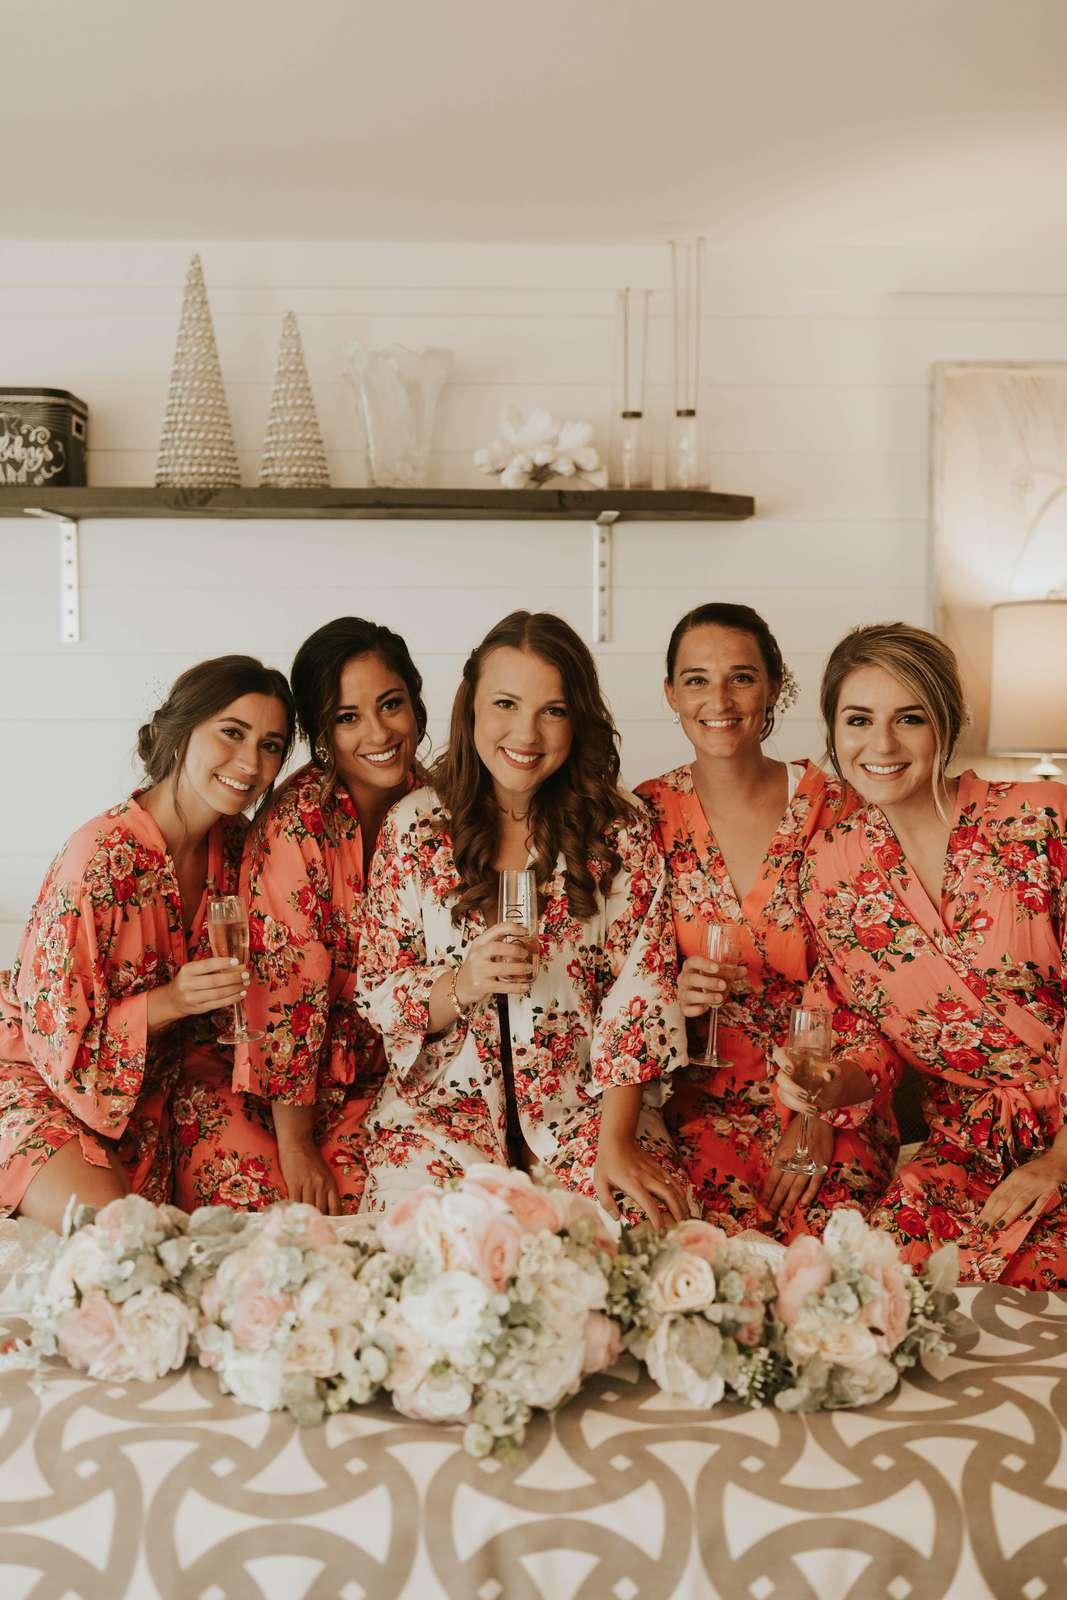 Bride & bridesmaids celelbrating